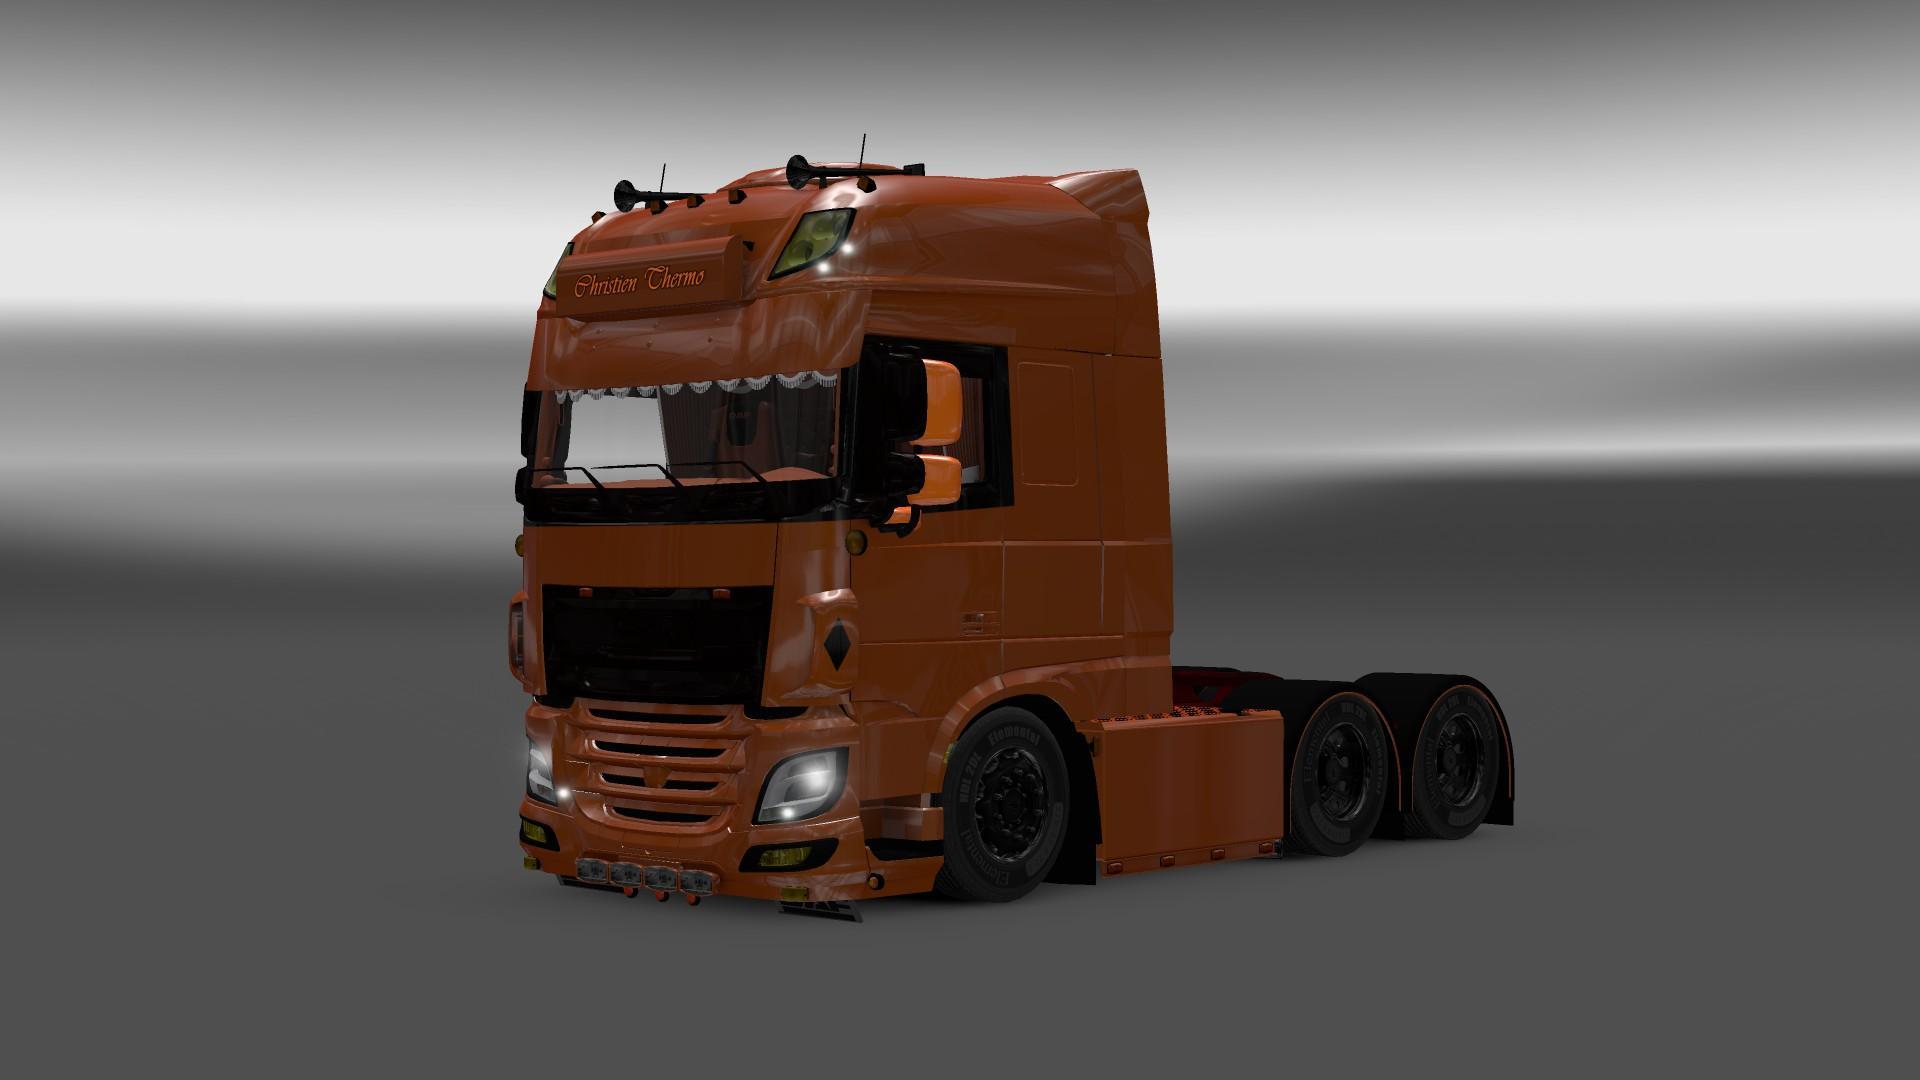 Euro truck simulator 2 mods daf xf 105 james s hislop pictures to pin -  6 Euro Truck Simulator 2 Mods Daf Xf 105 James S Hislop Pictures To Pin